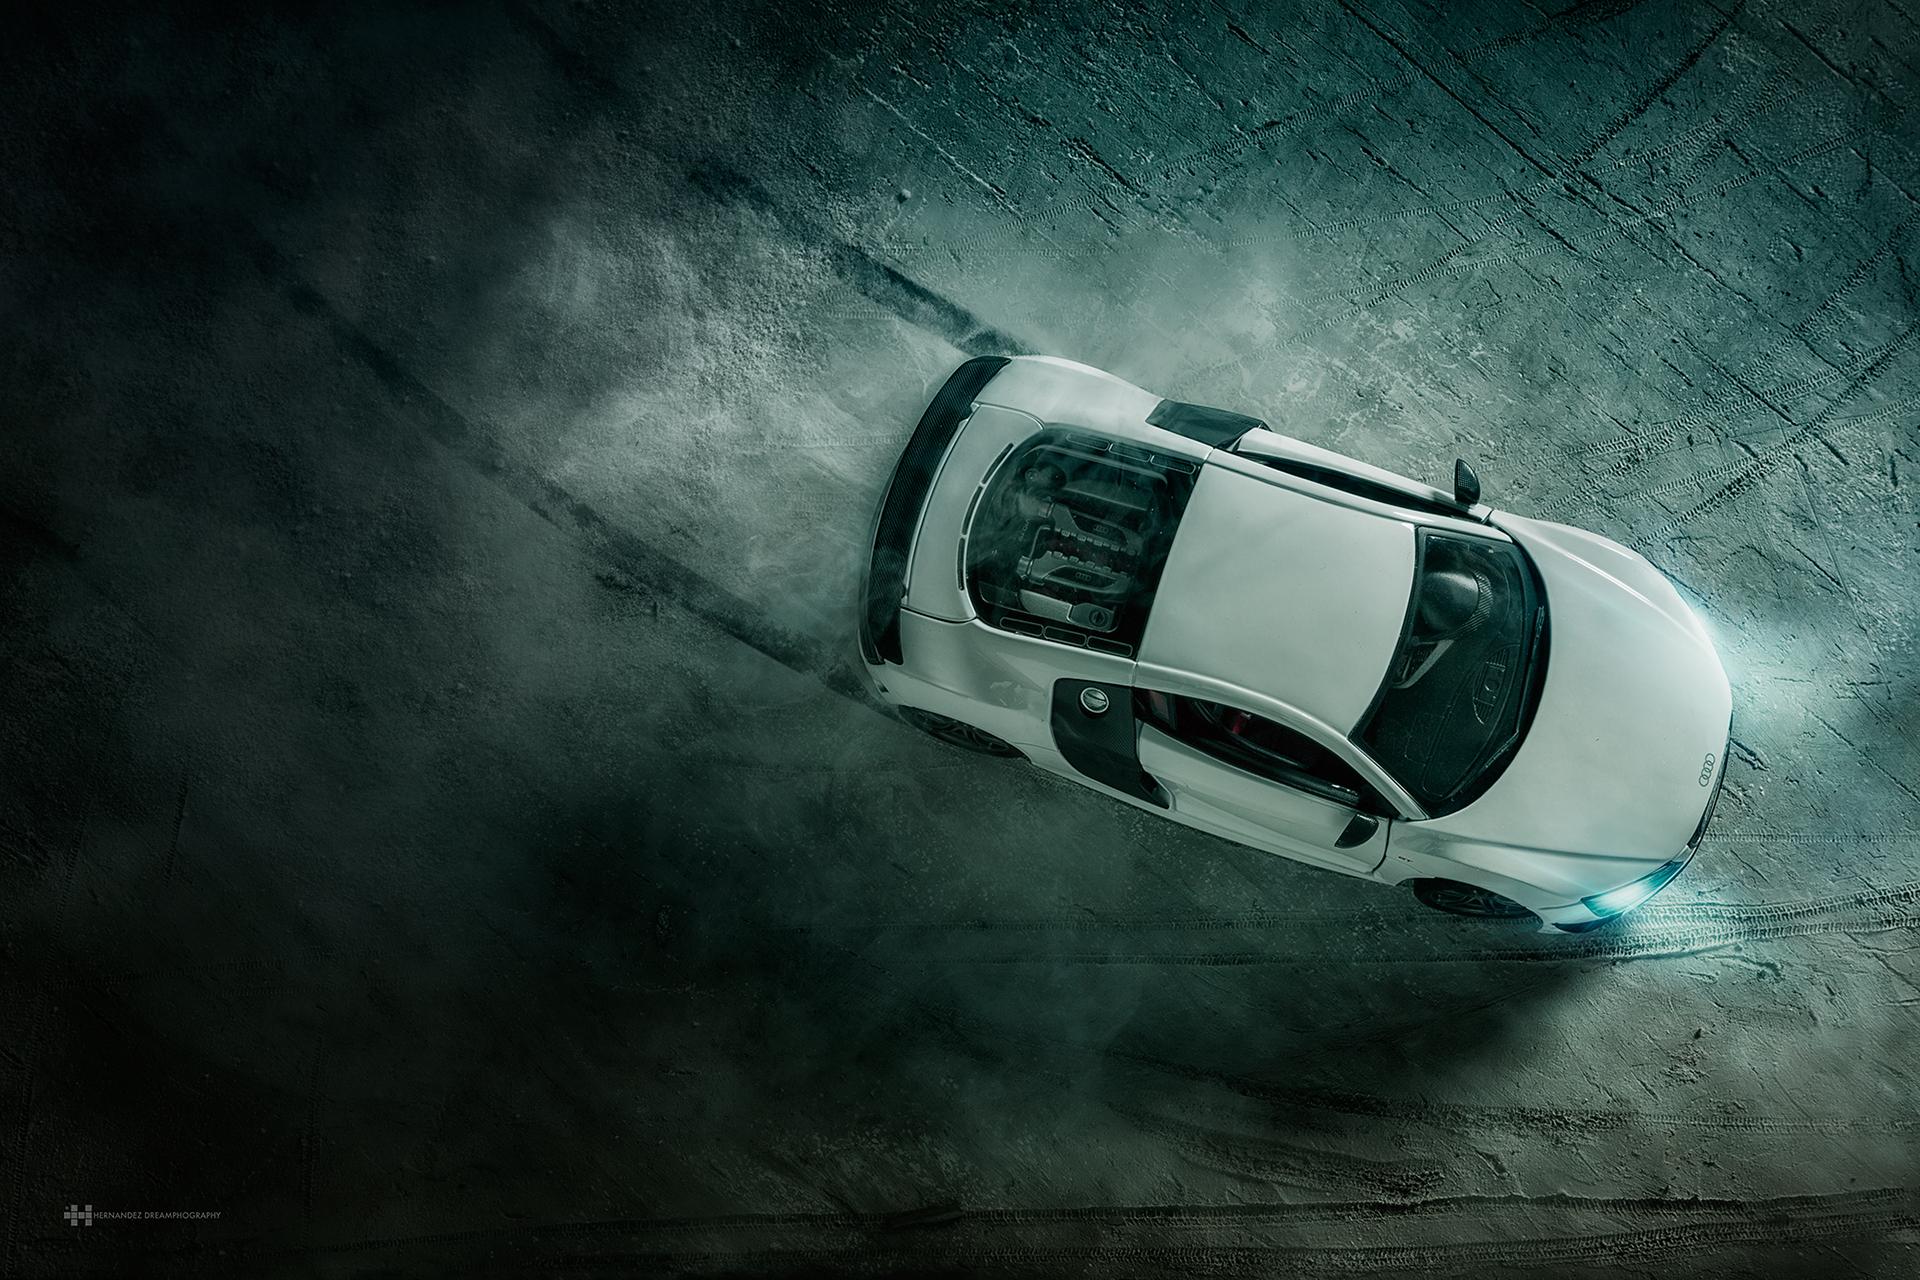 Audi R8 - Miniature Scale Model Car Photography (10)